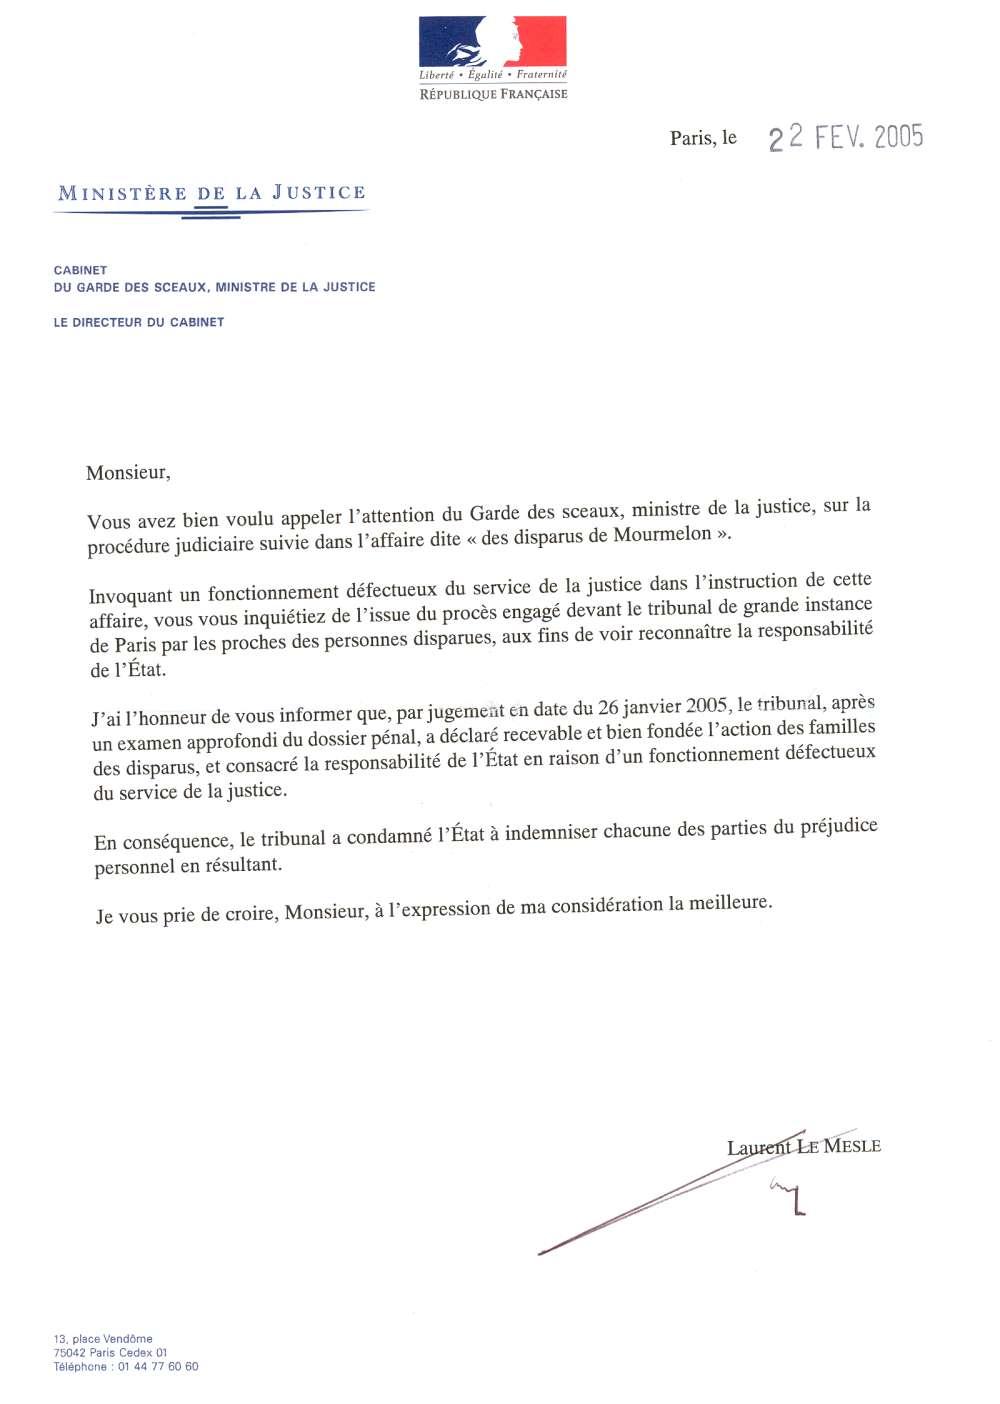 modele lettre administrative justice